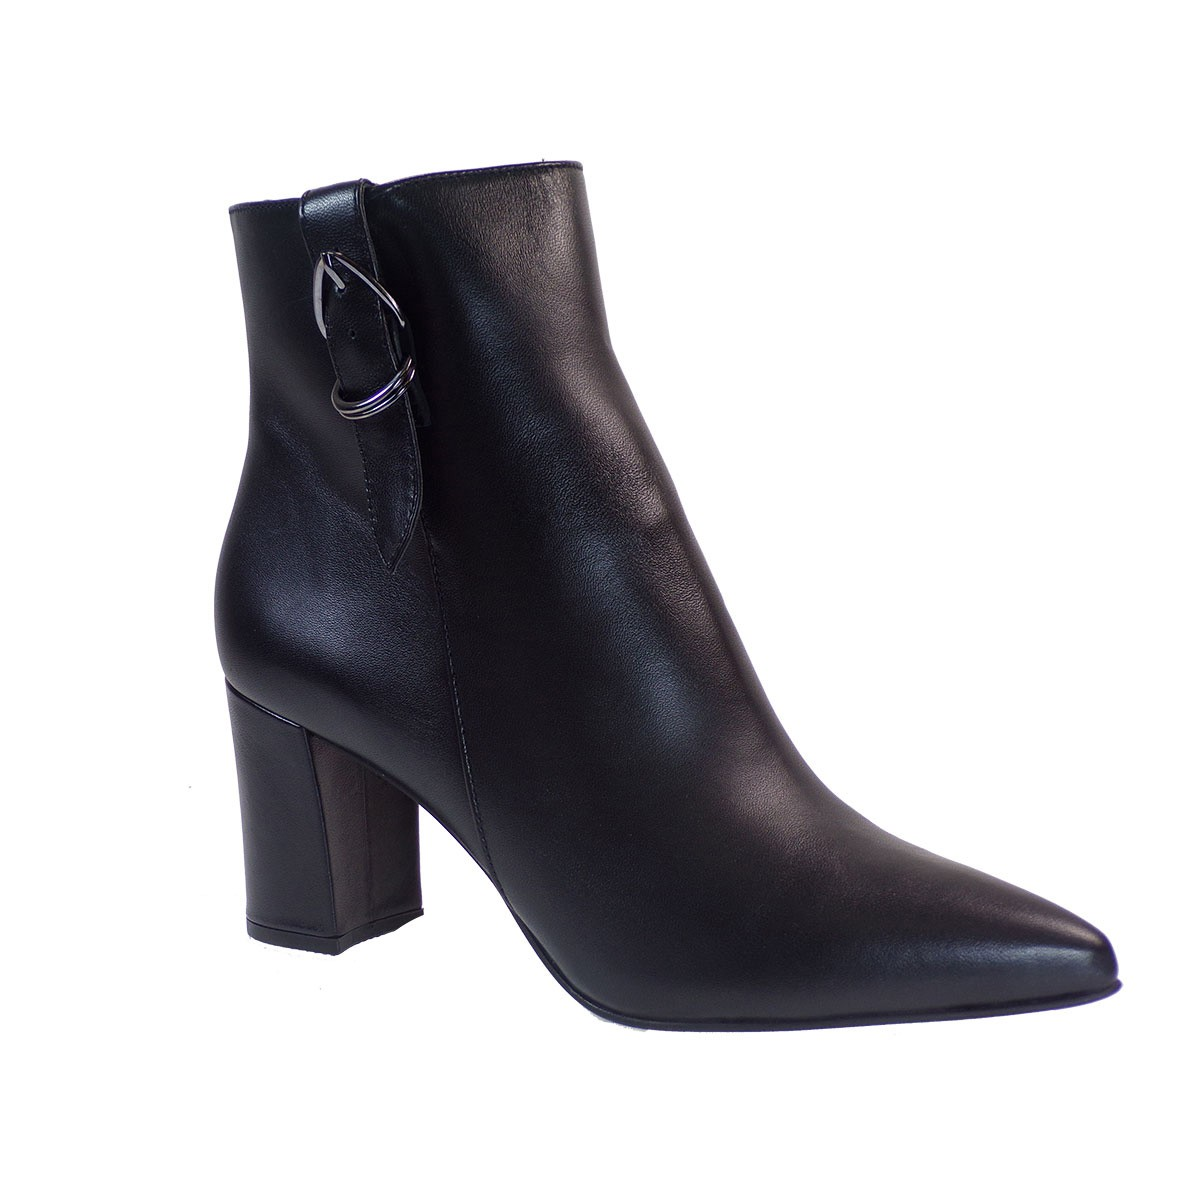 Fardoulis Shoes Γυναικεία Παπούτσια Μποτάκια 6528X Μαύρο Δέρμα